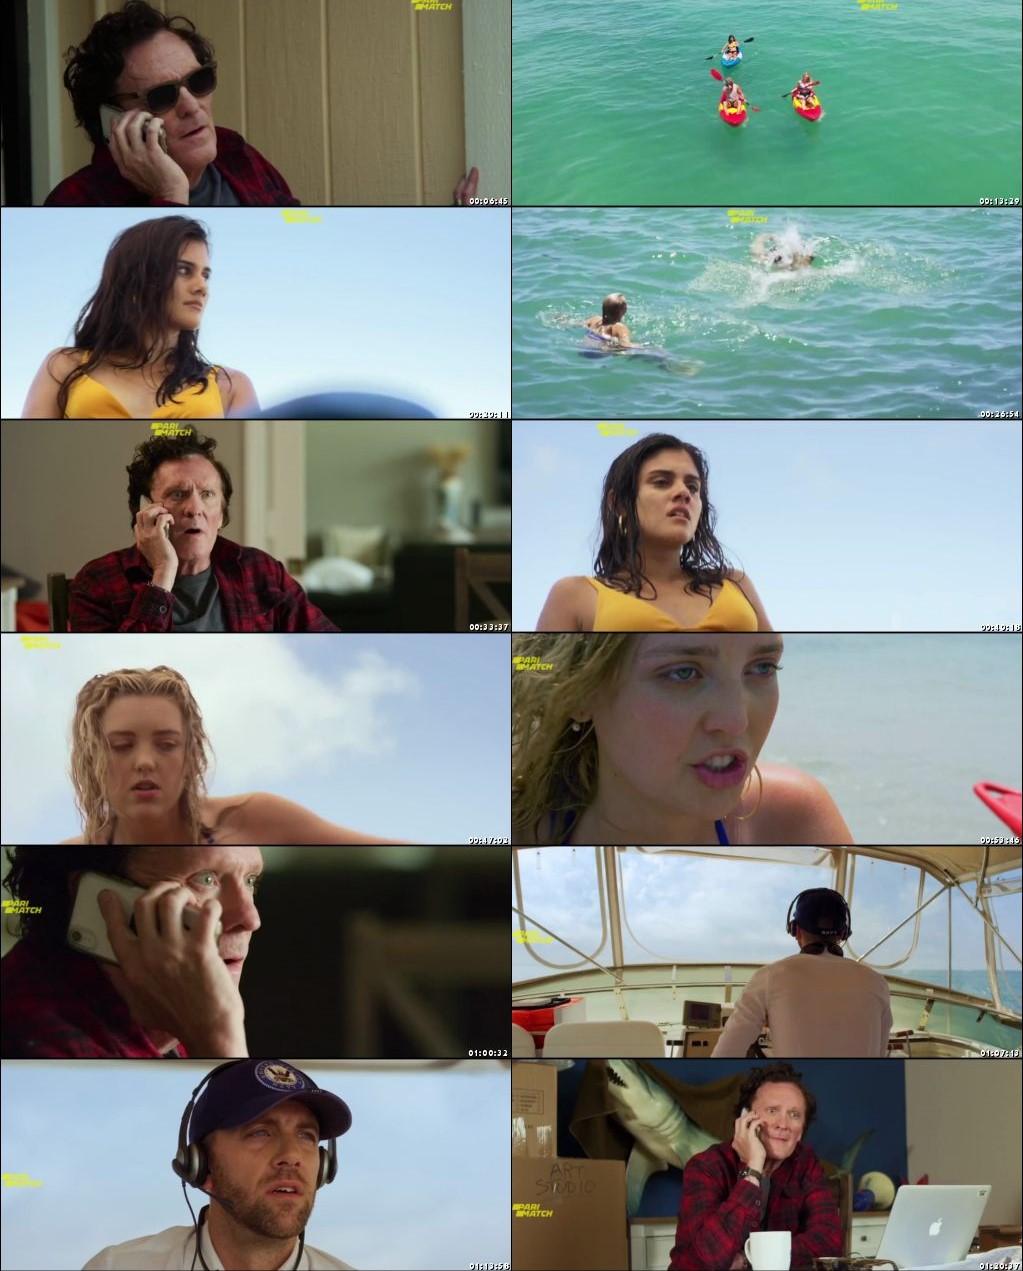 Shark Season 2020 Full Movie Online Watch